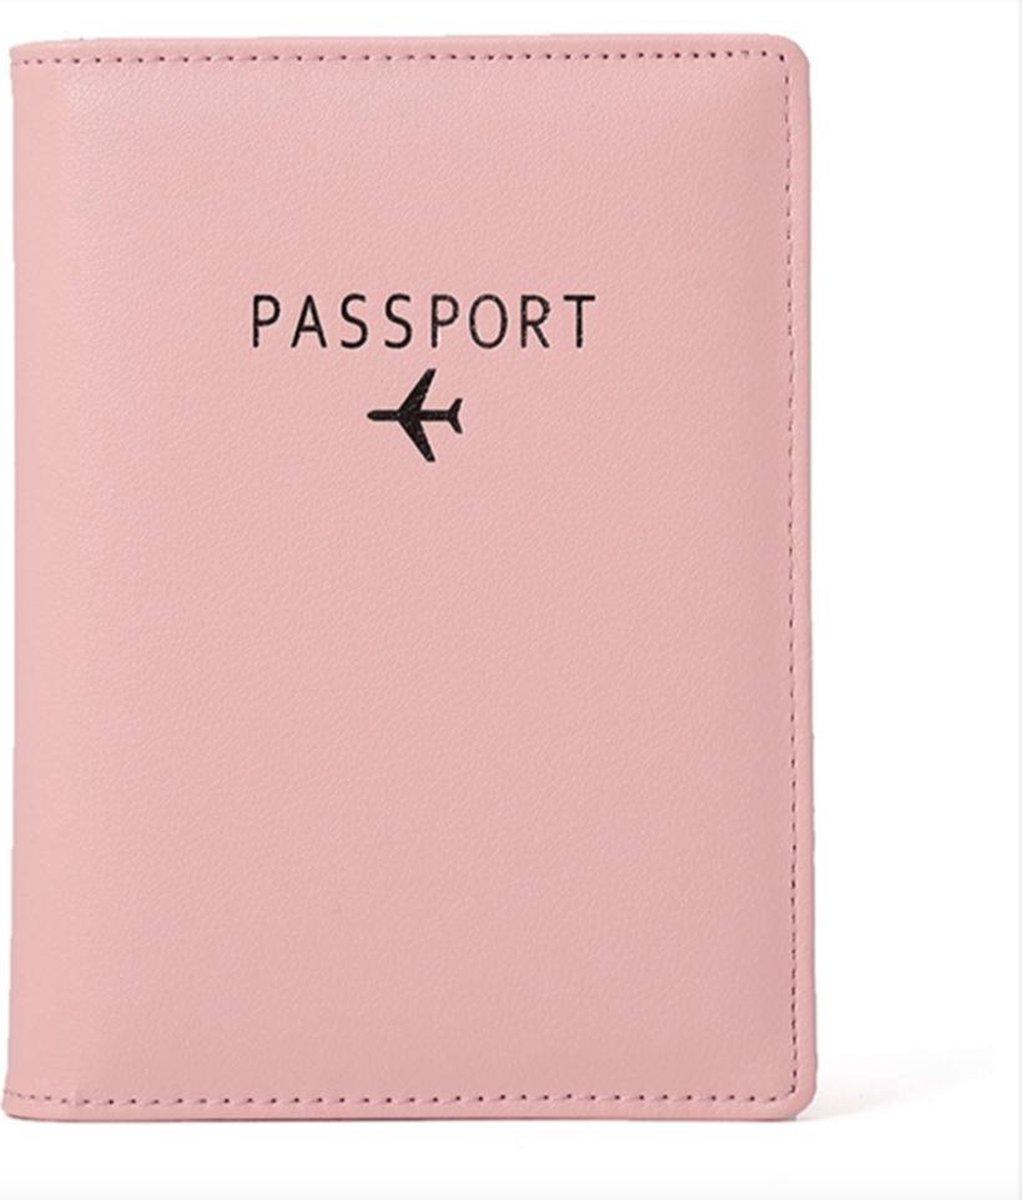 Paspoort Cover Roze & Pasjeshouder - Premium Quality! Paspoorthoes Paspoorthouder Paspoort Hoesje Ma